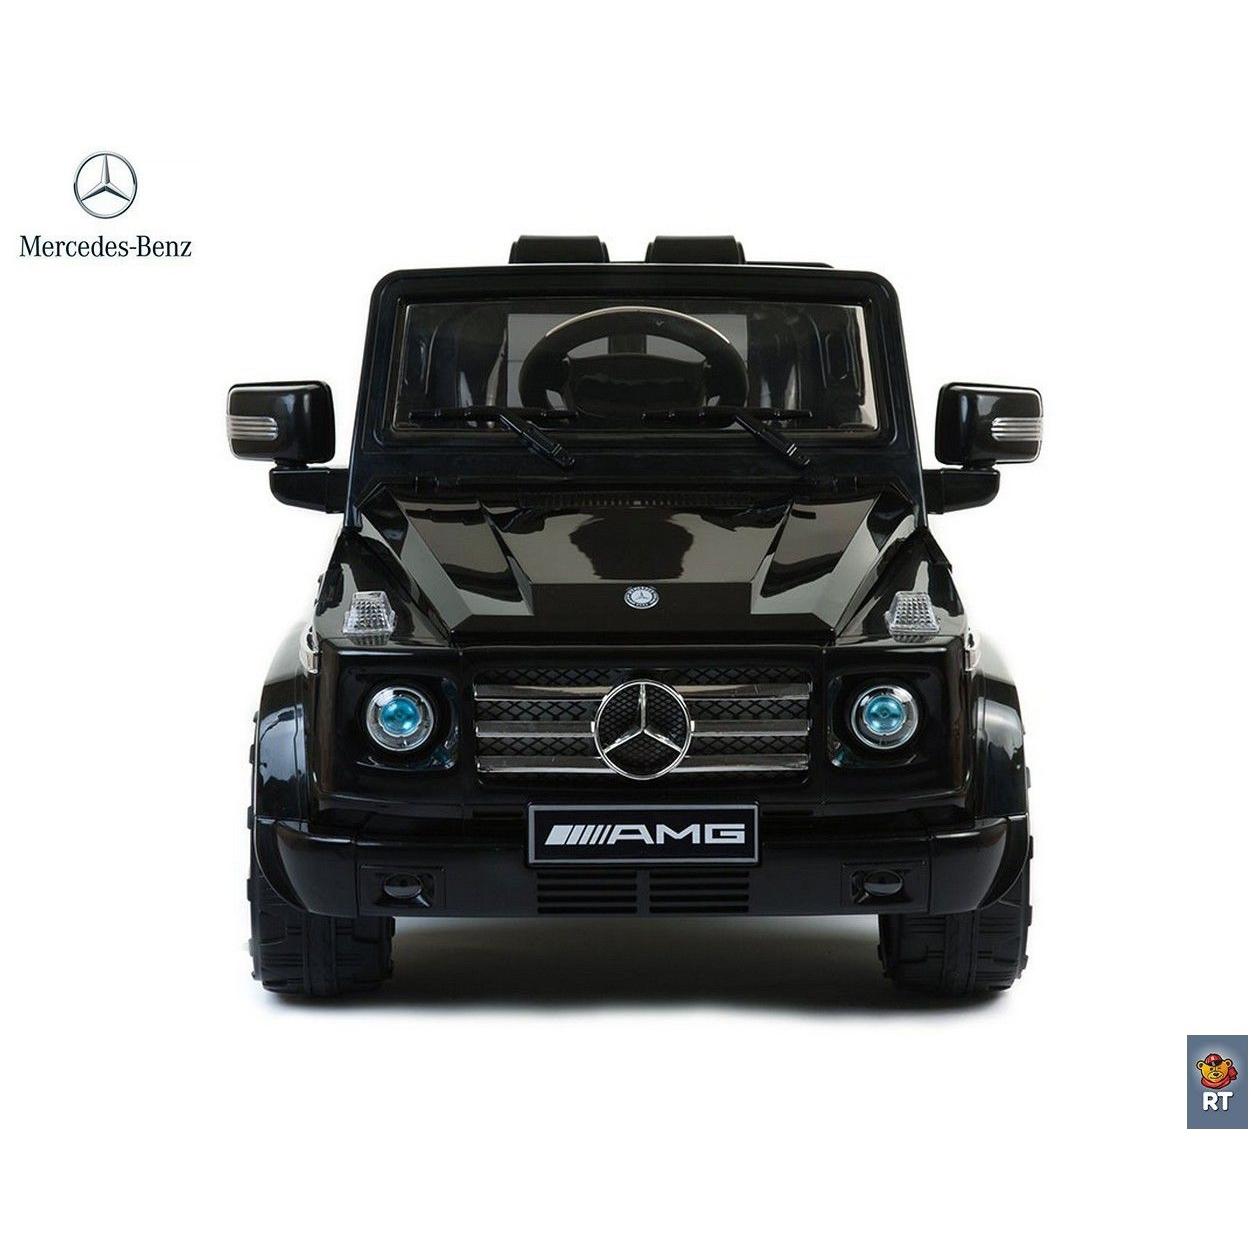 Электромобиль RT Mercedes-Benz AMG NEW Version Black<br>